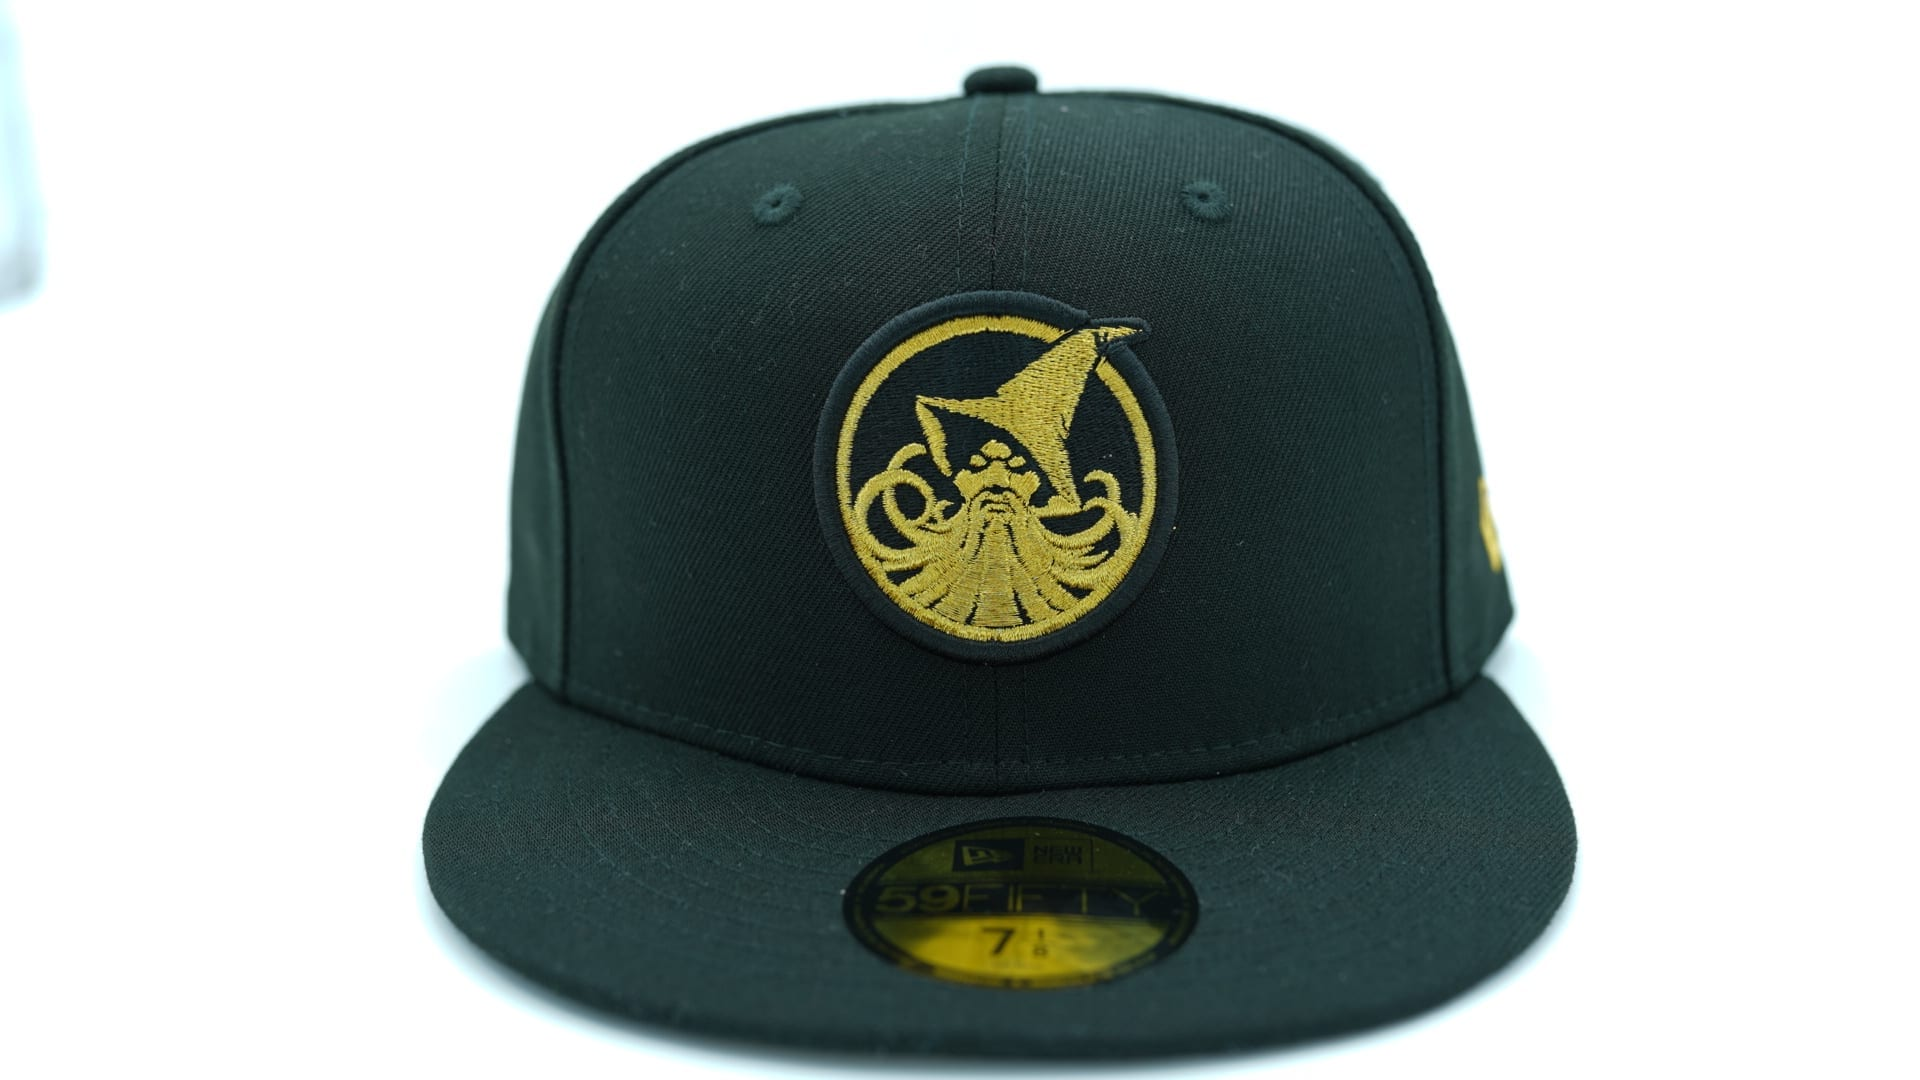 Ninja turtle baseball cap : Monogram jewelry box